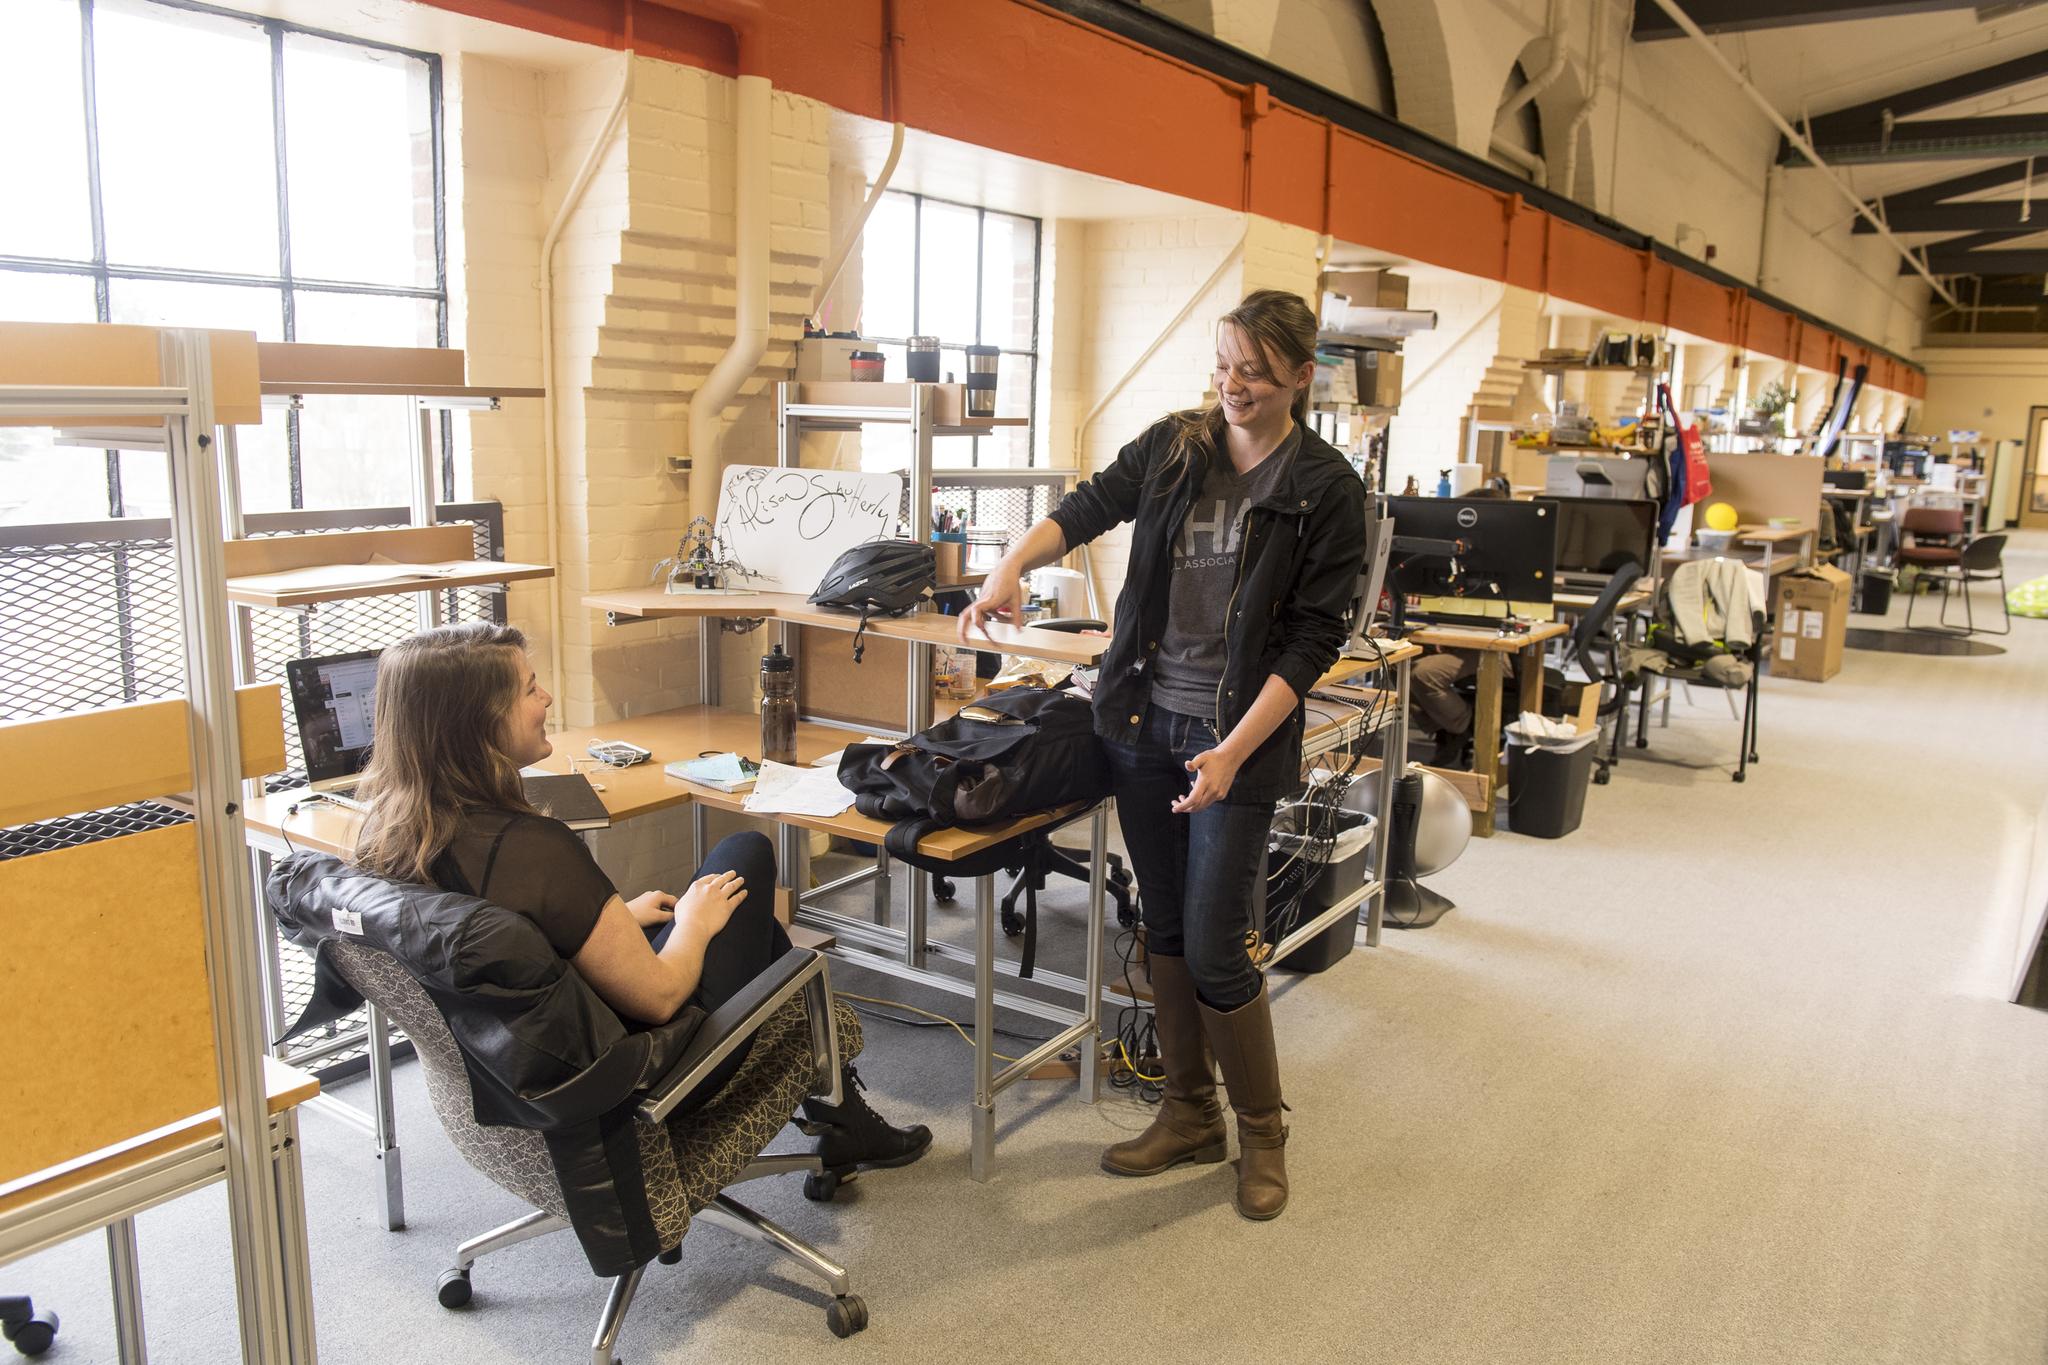 OSU Students in OSU research facilities